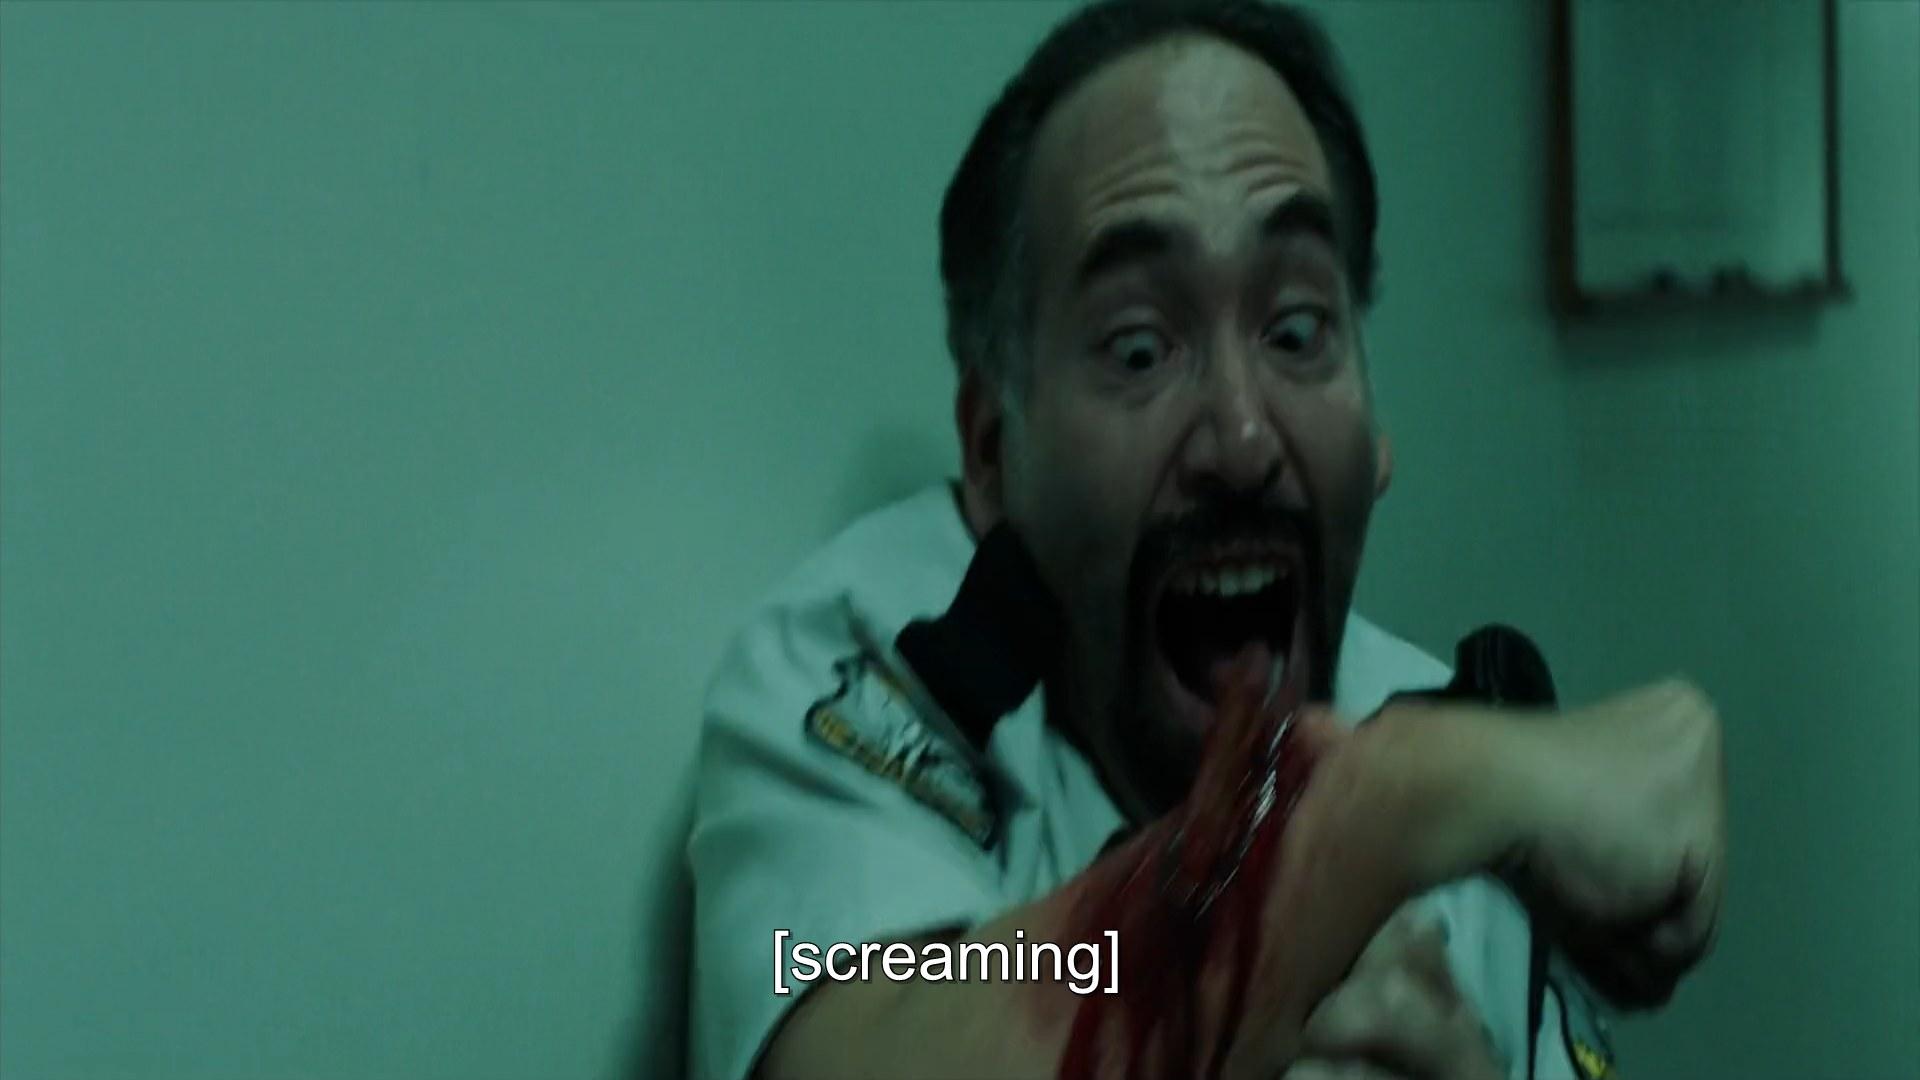 A man screams at his broken arm bone sticking out